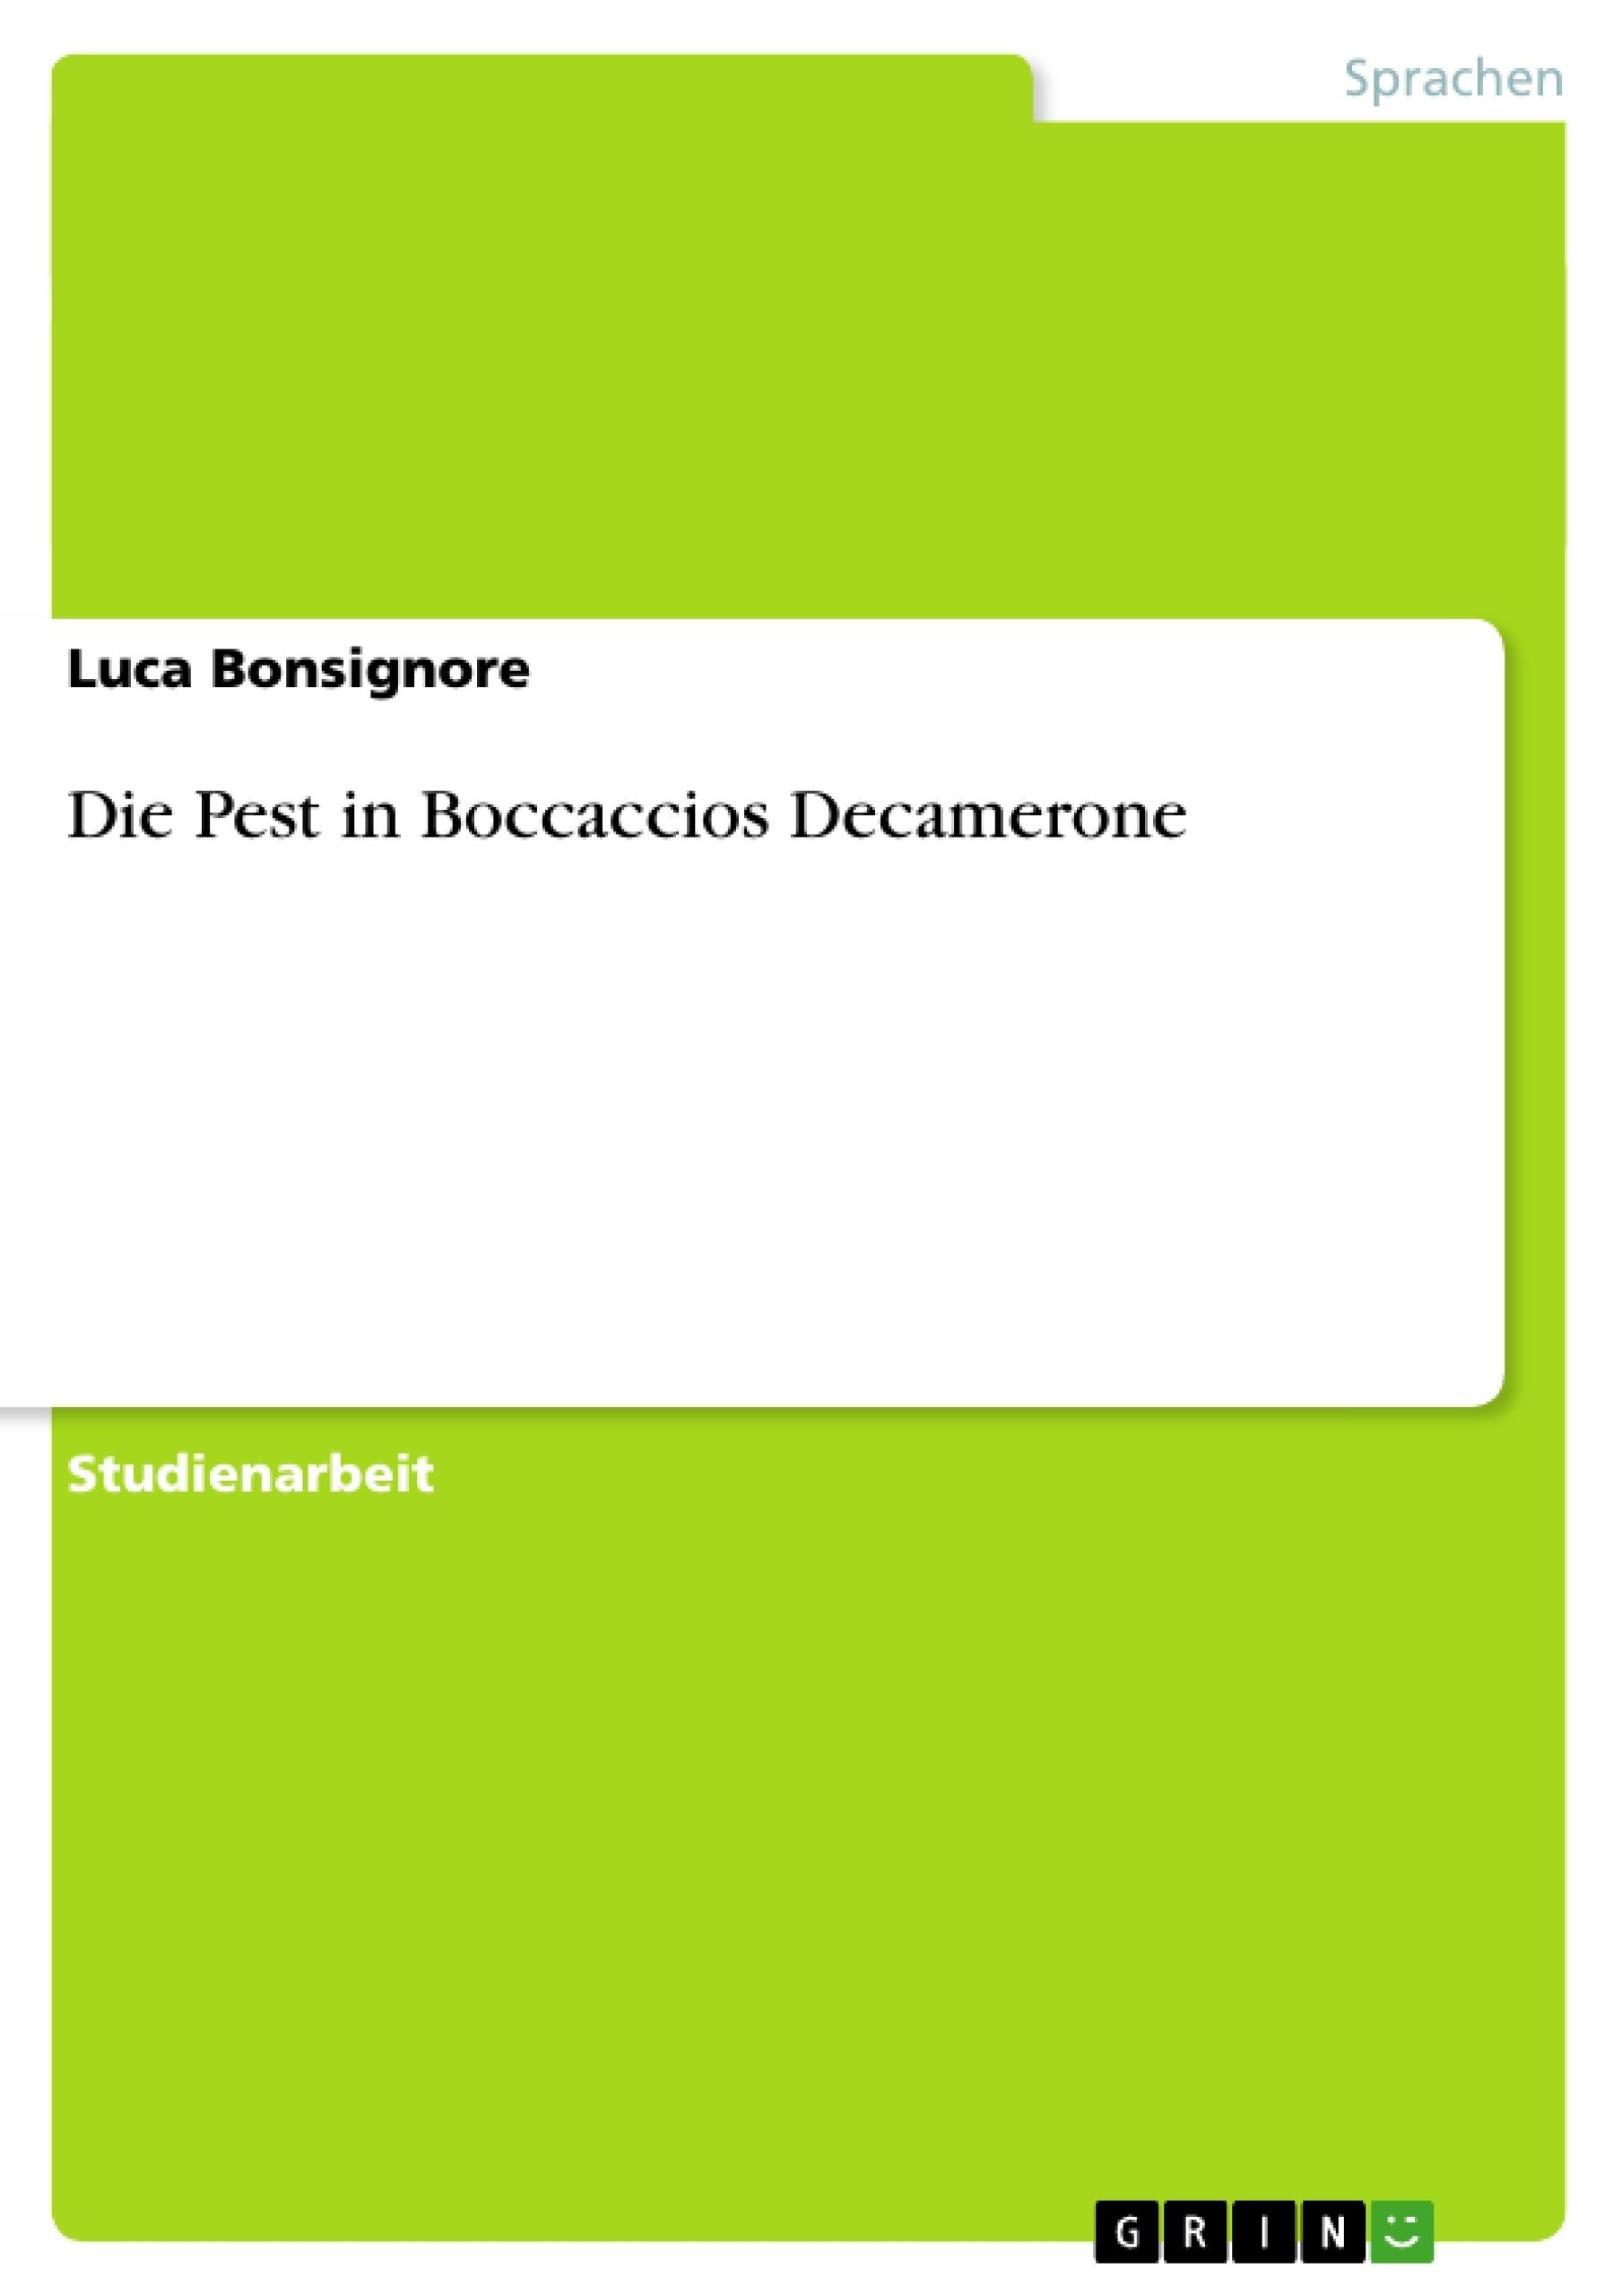 Titel: Die Pest in Boccaccios Decamerone